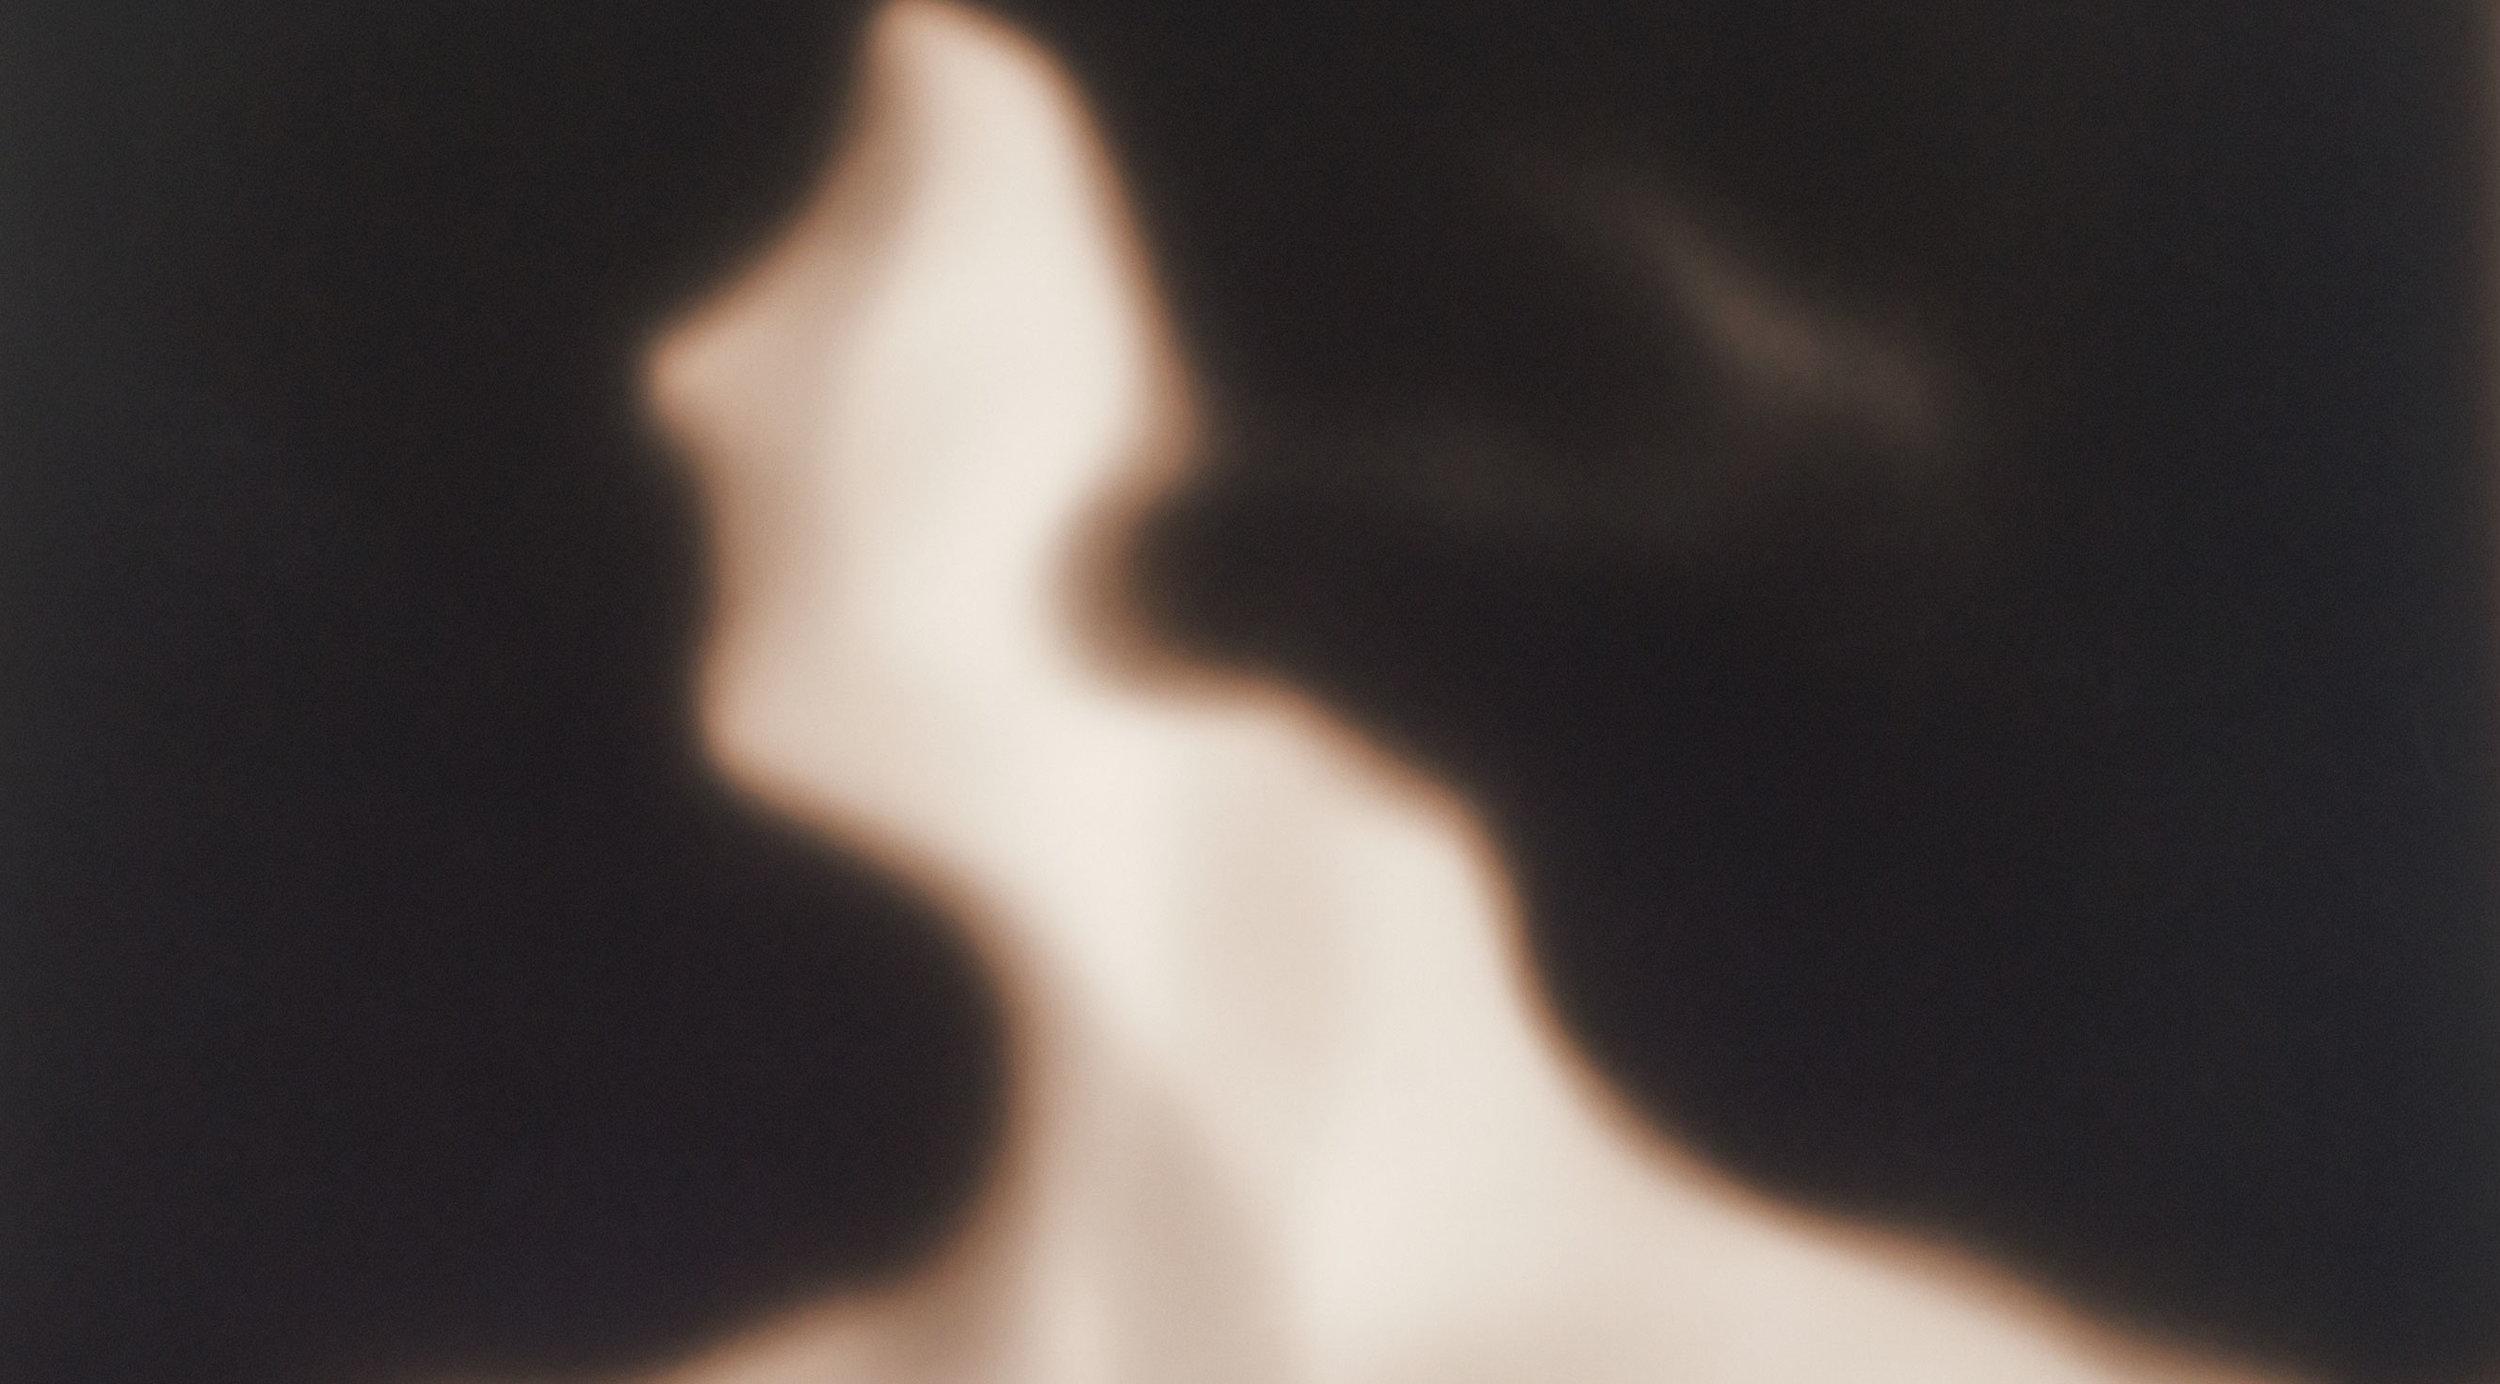 Greta-8-cropped.jpg